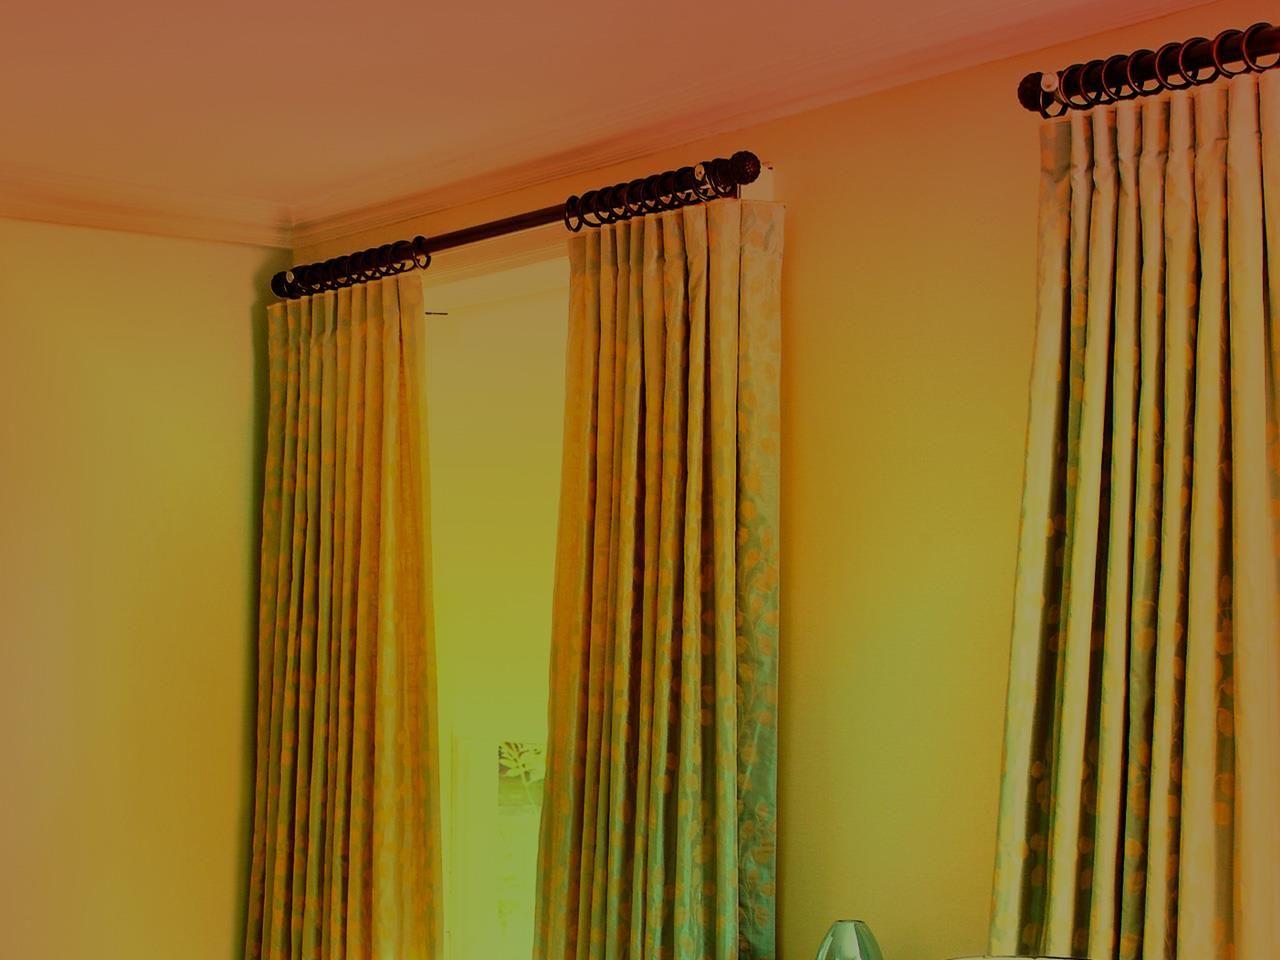 Bamboo Curtain Rods Bamboo Curtains Curtain Rods Curtains